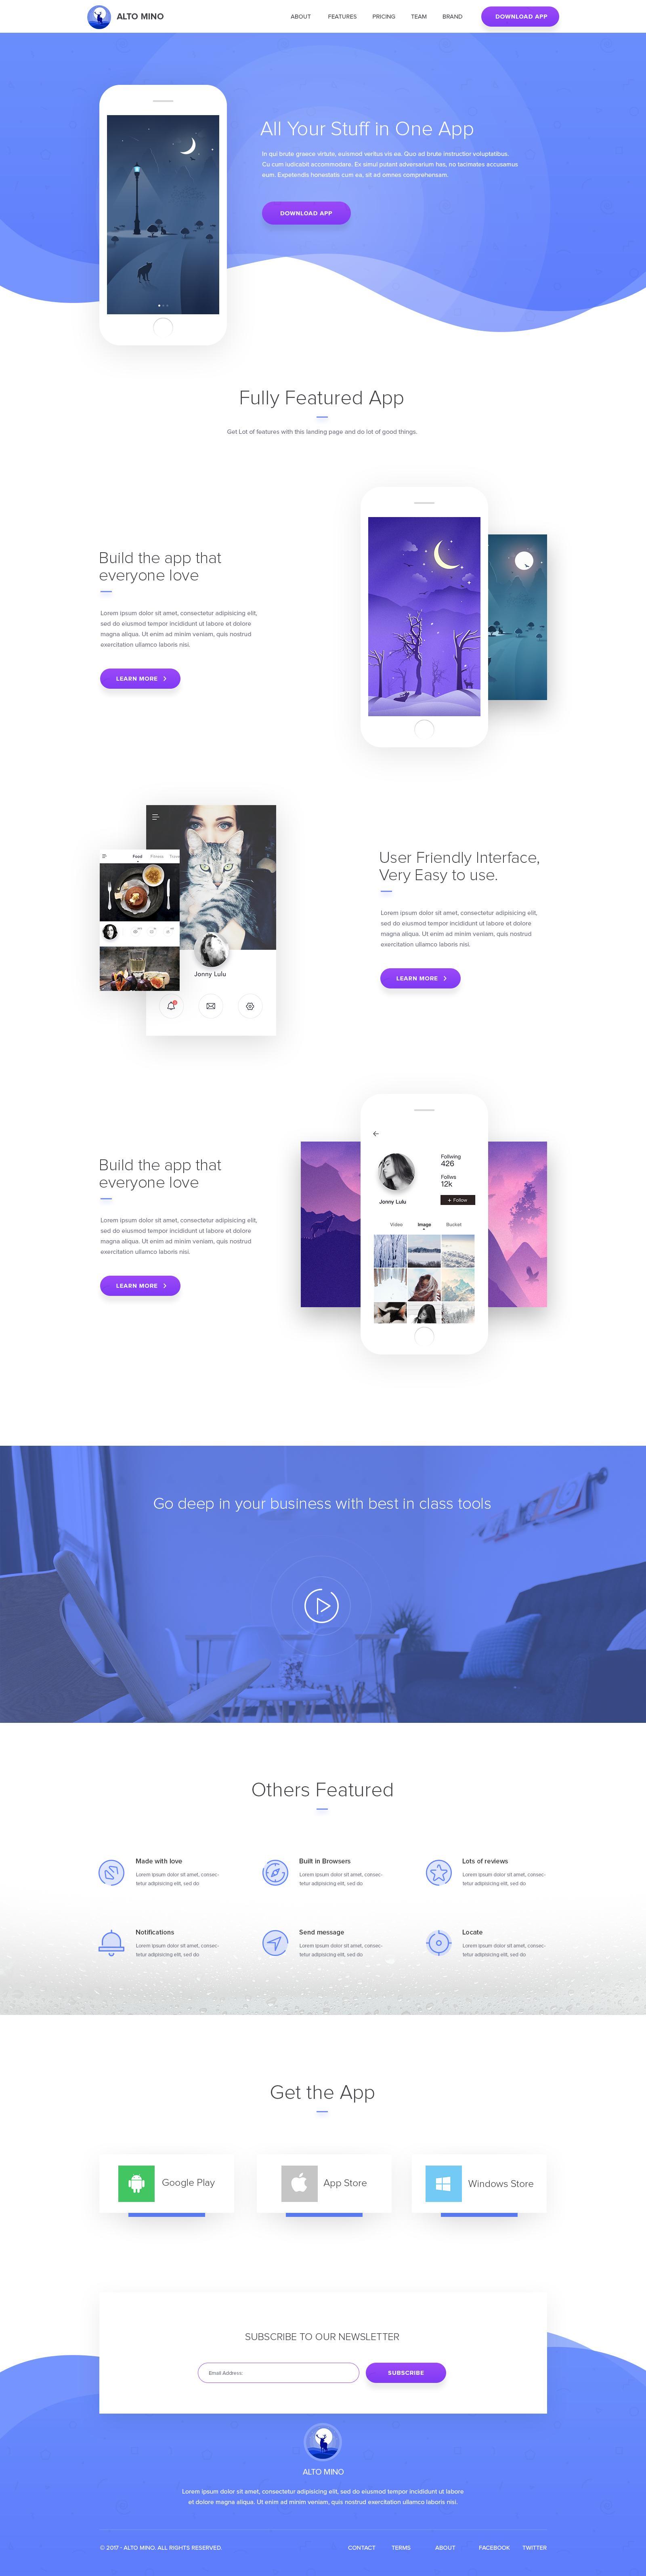 Landing Page Design For Mobile App Web Layout Design Web Design Trends Page Design